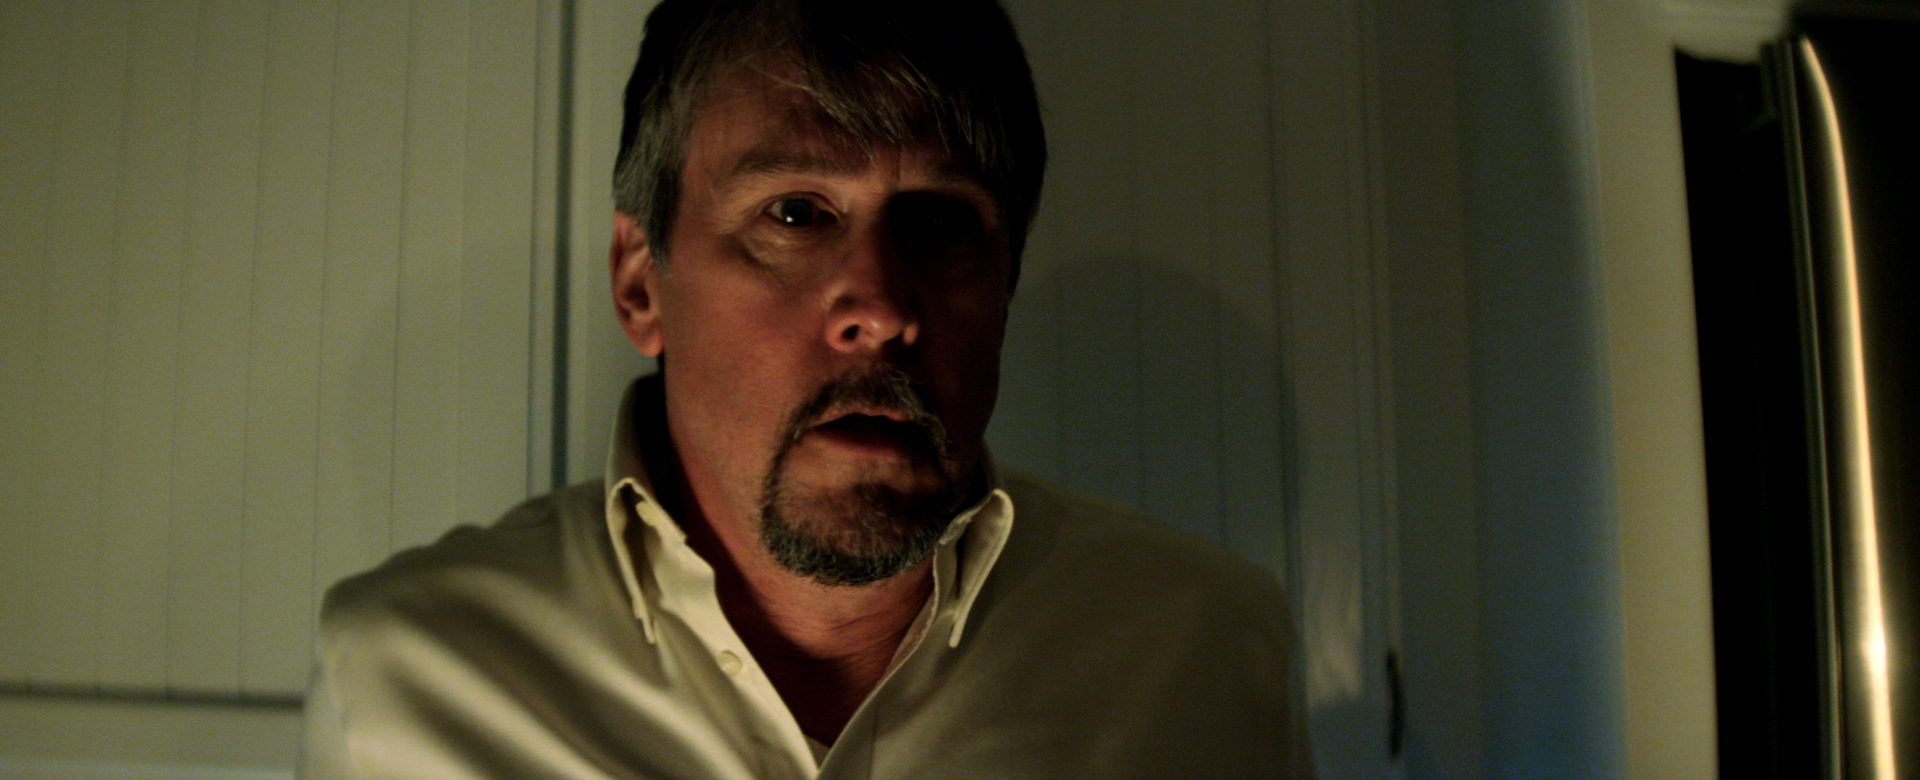 Alan Ruck in Deathly (2015)